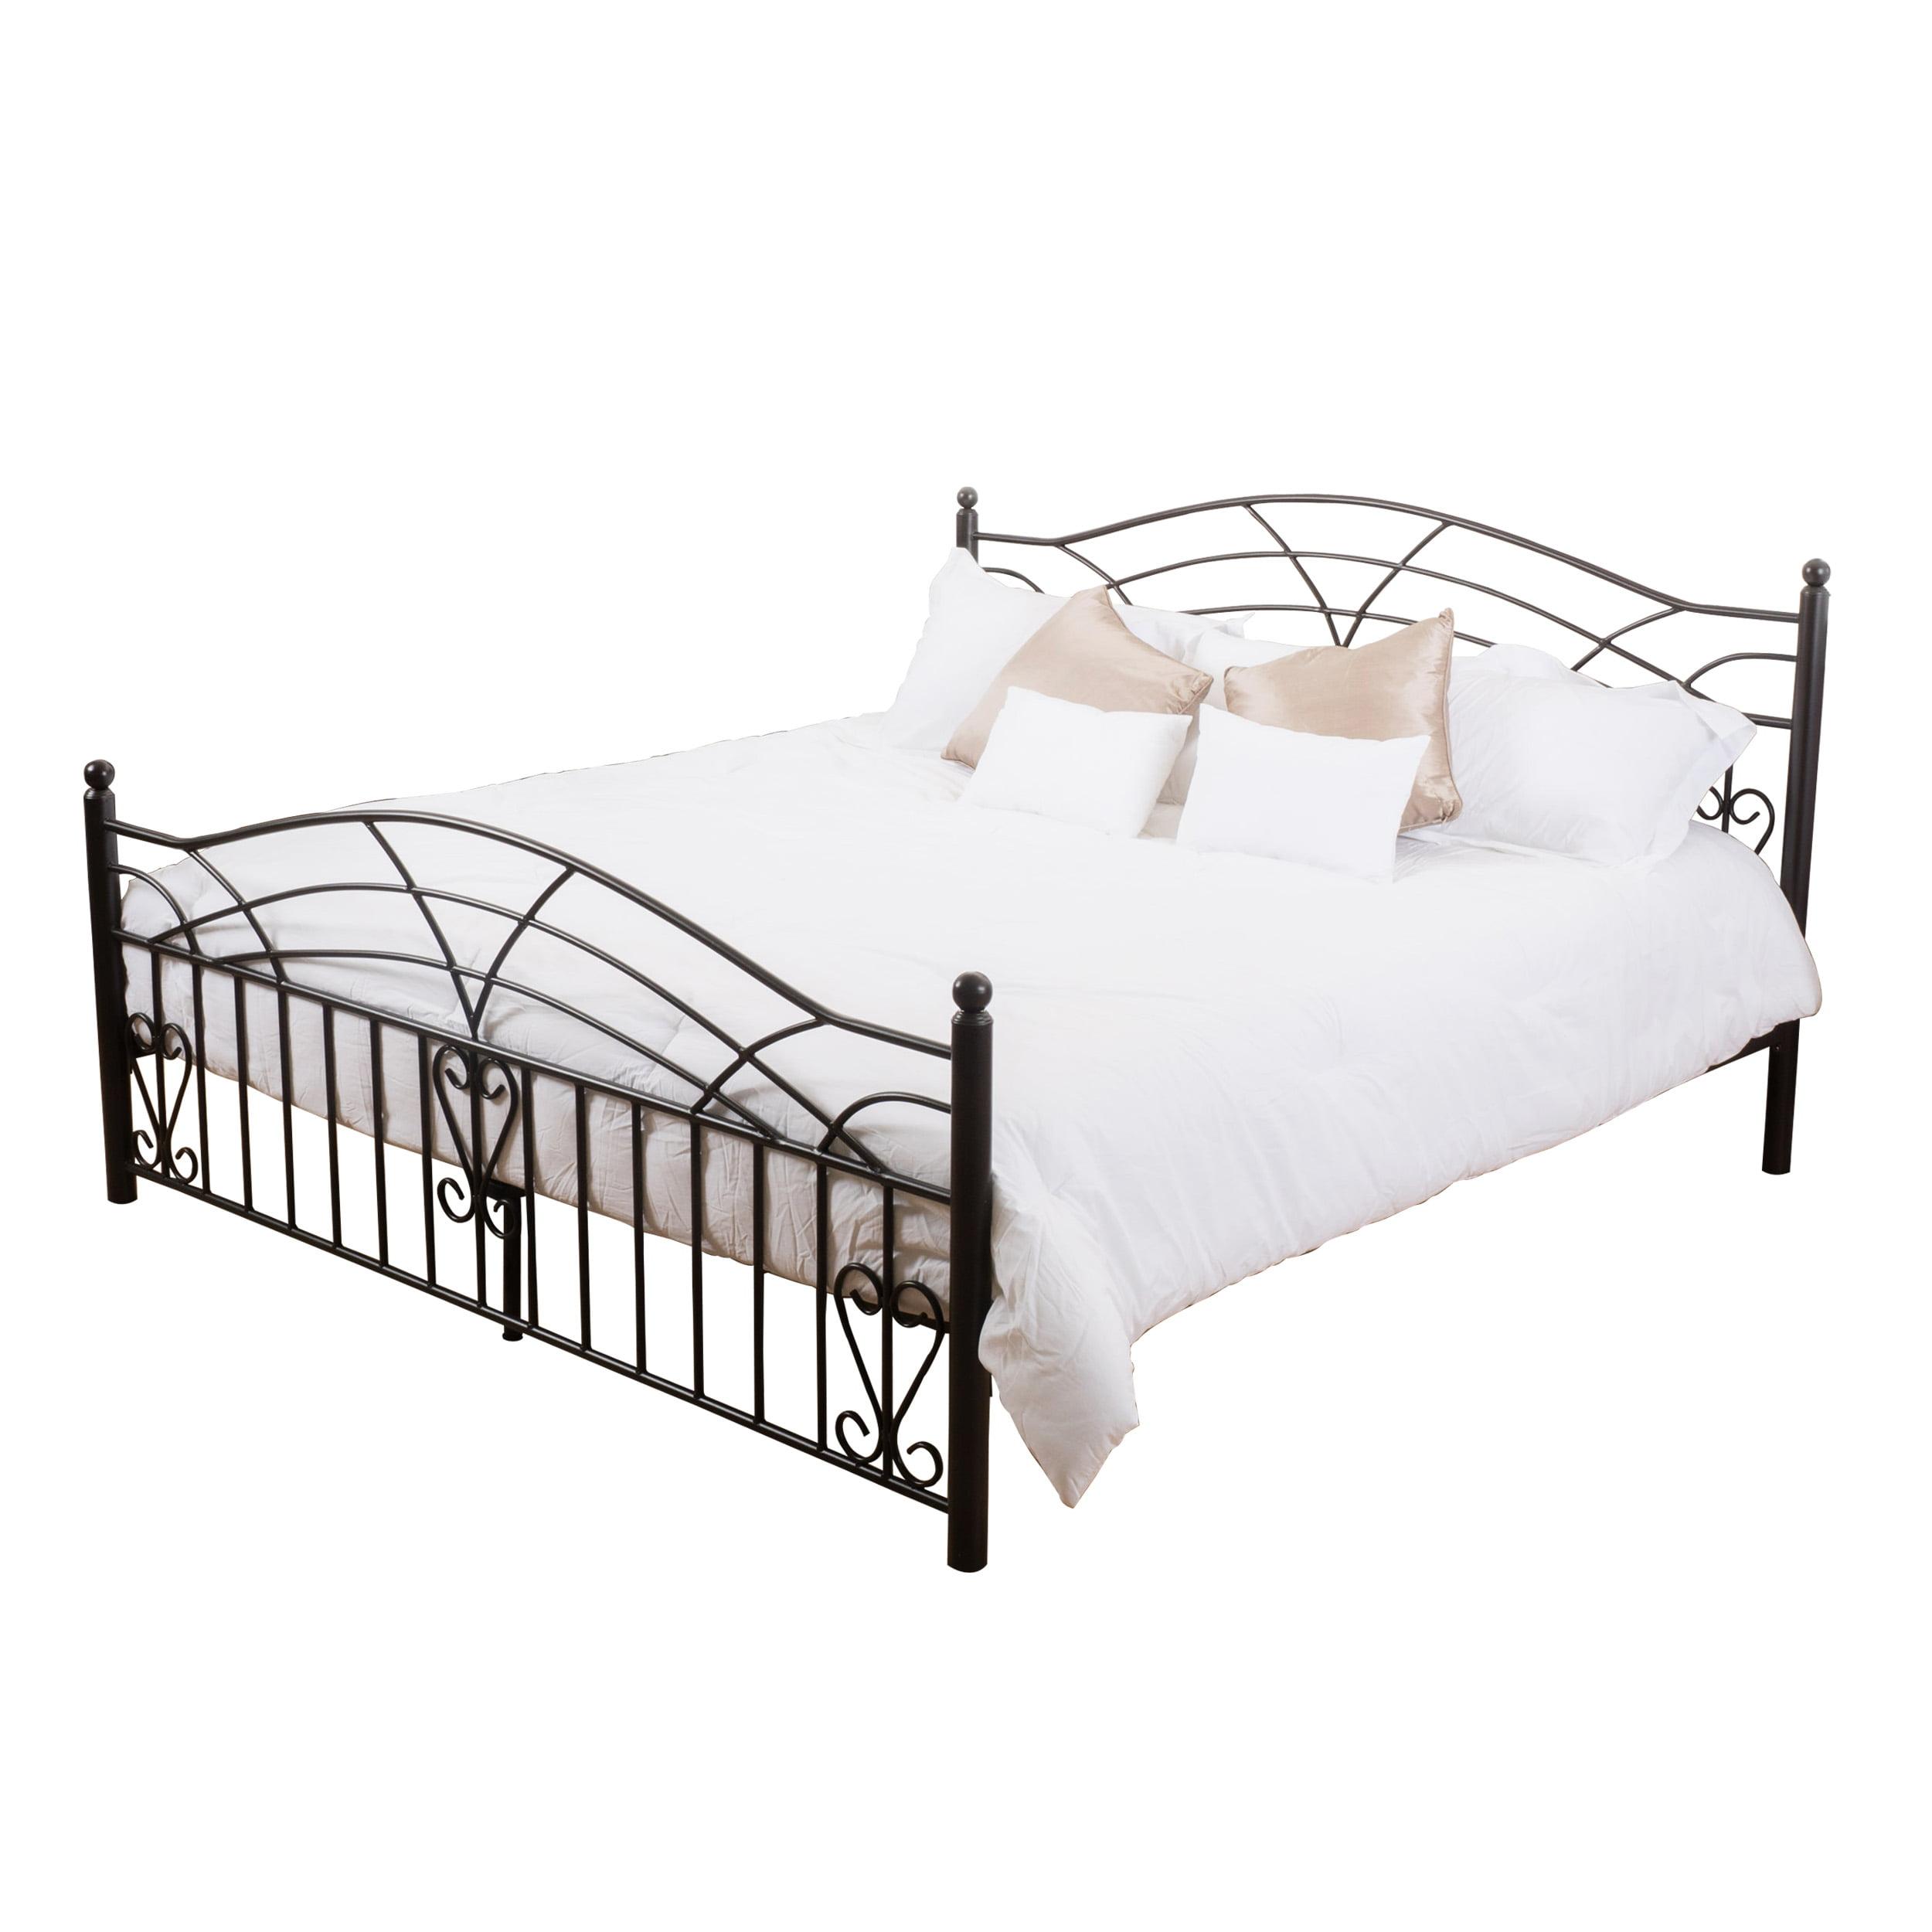 Bradburry King-Size Bed Frame, Copper